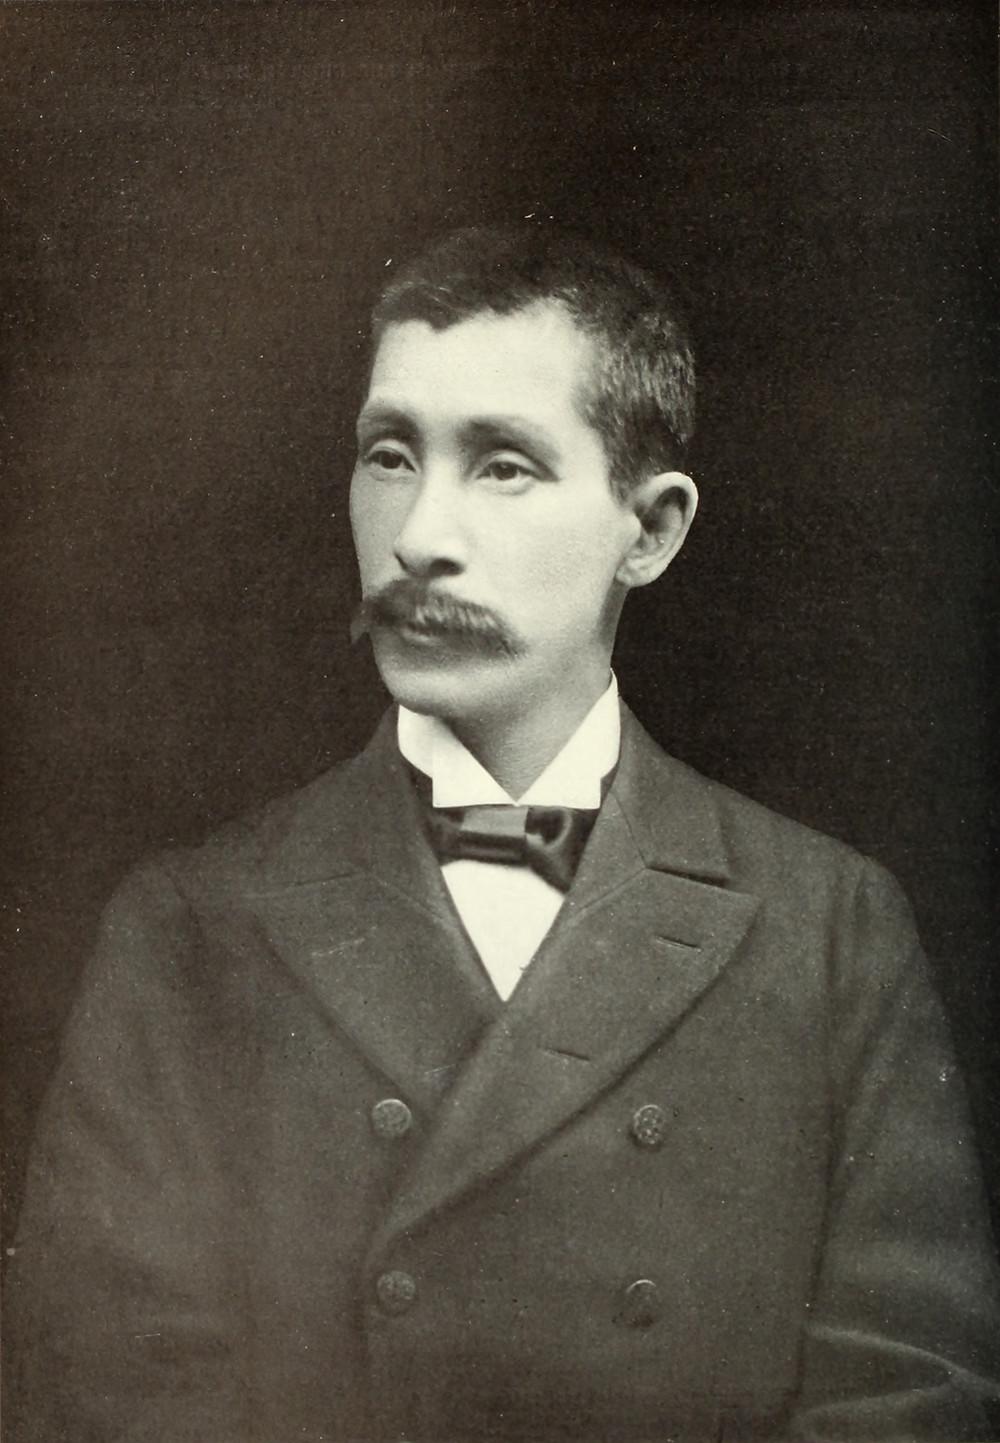 Jutarō Komura